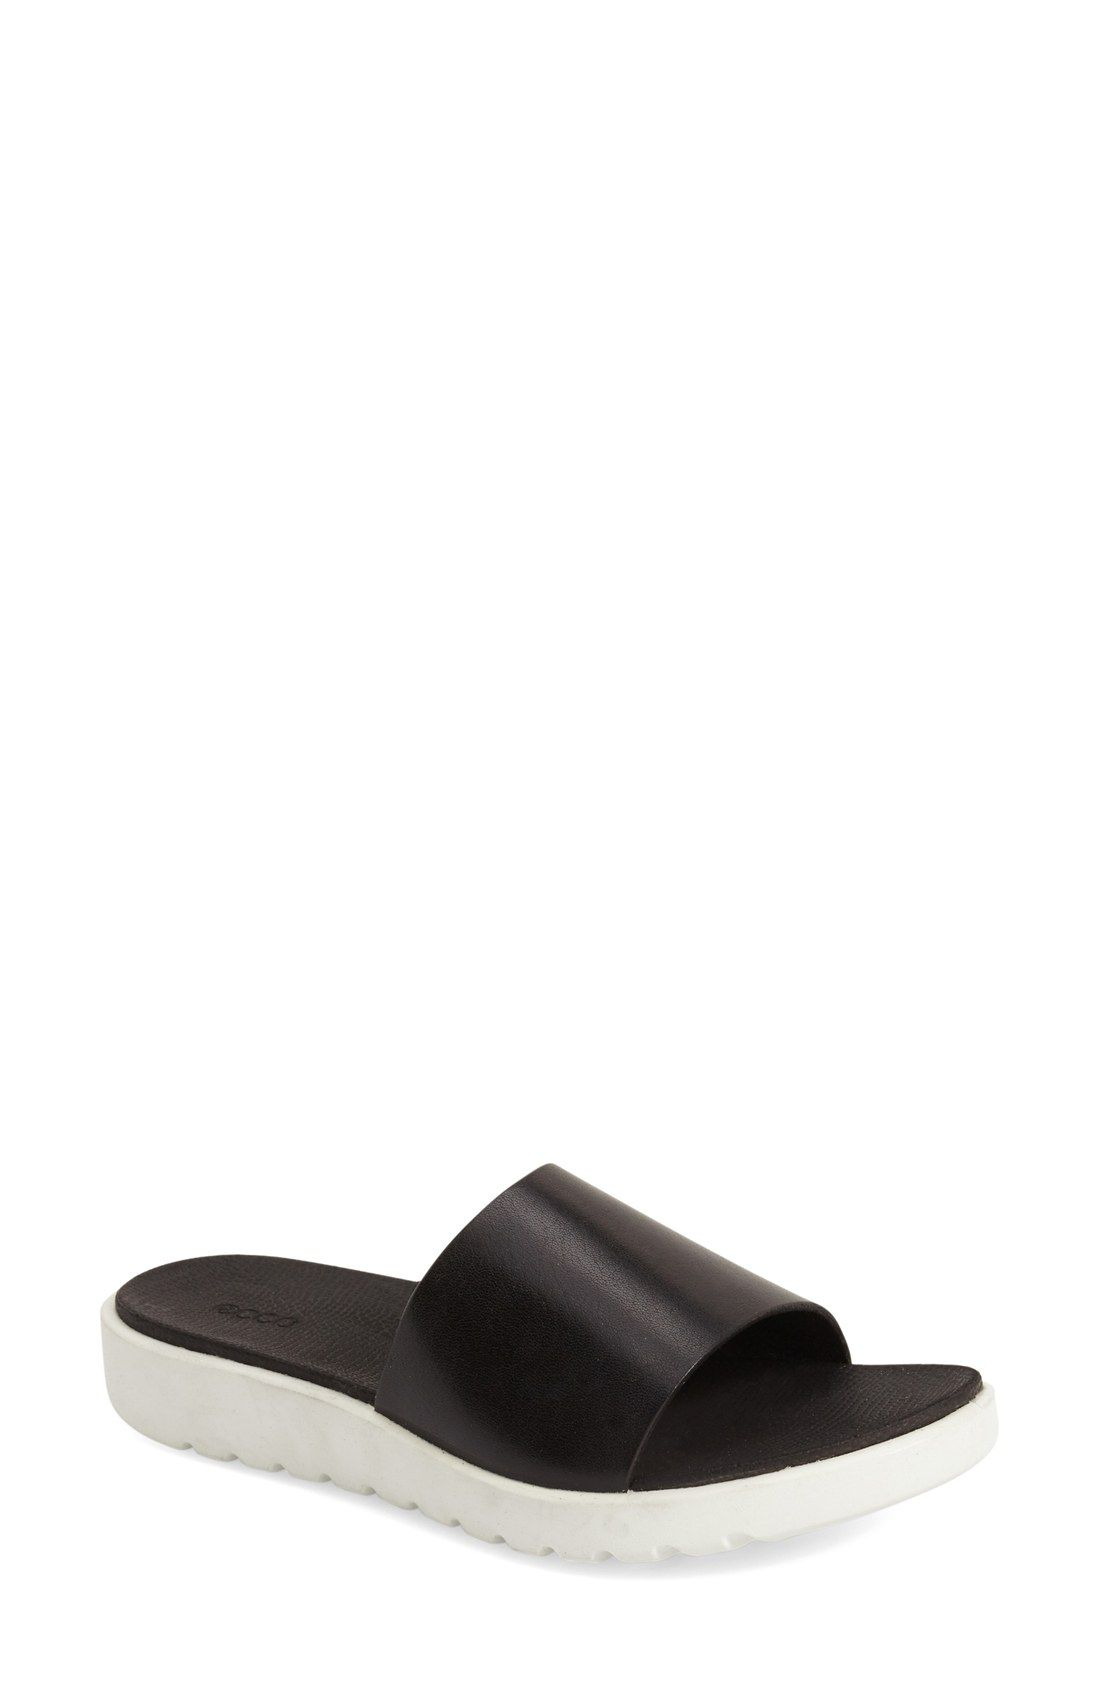 ECCO: Meet the new ECCO Freja sandal: trend and comfort